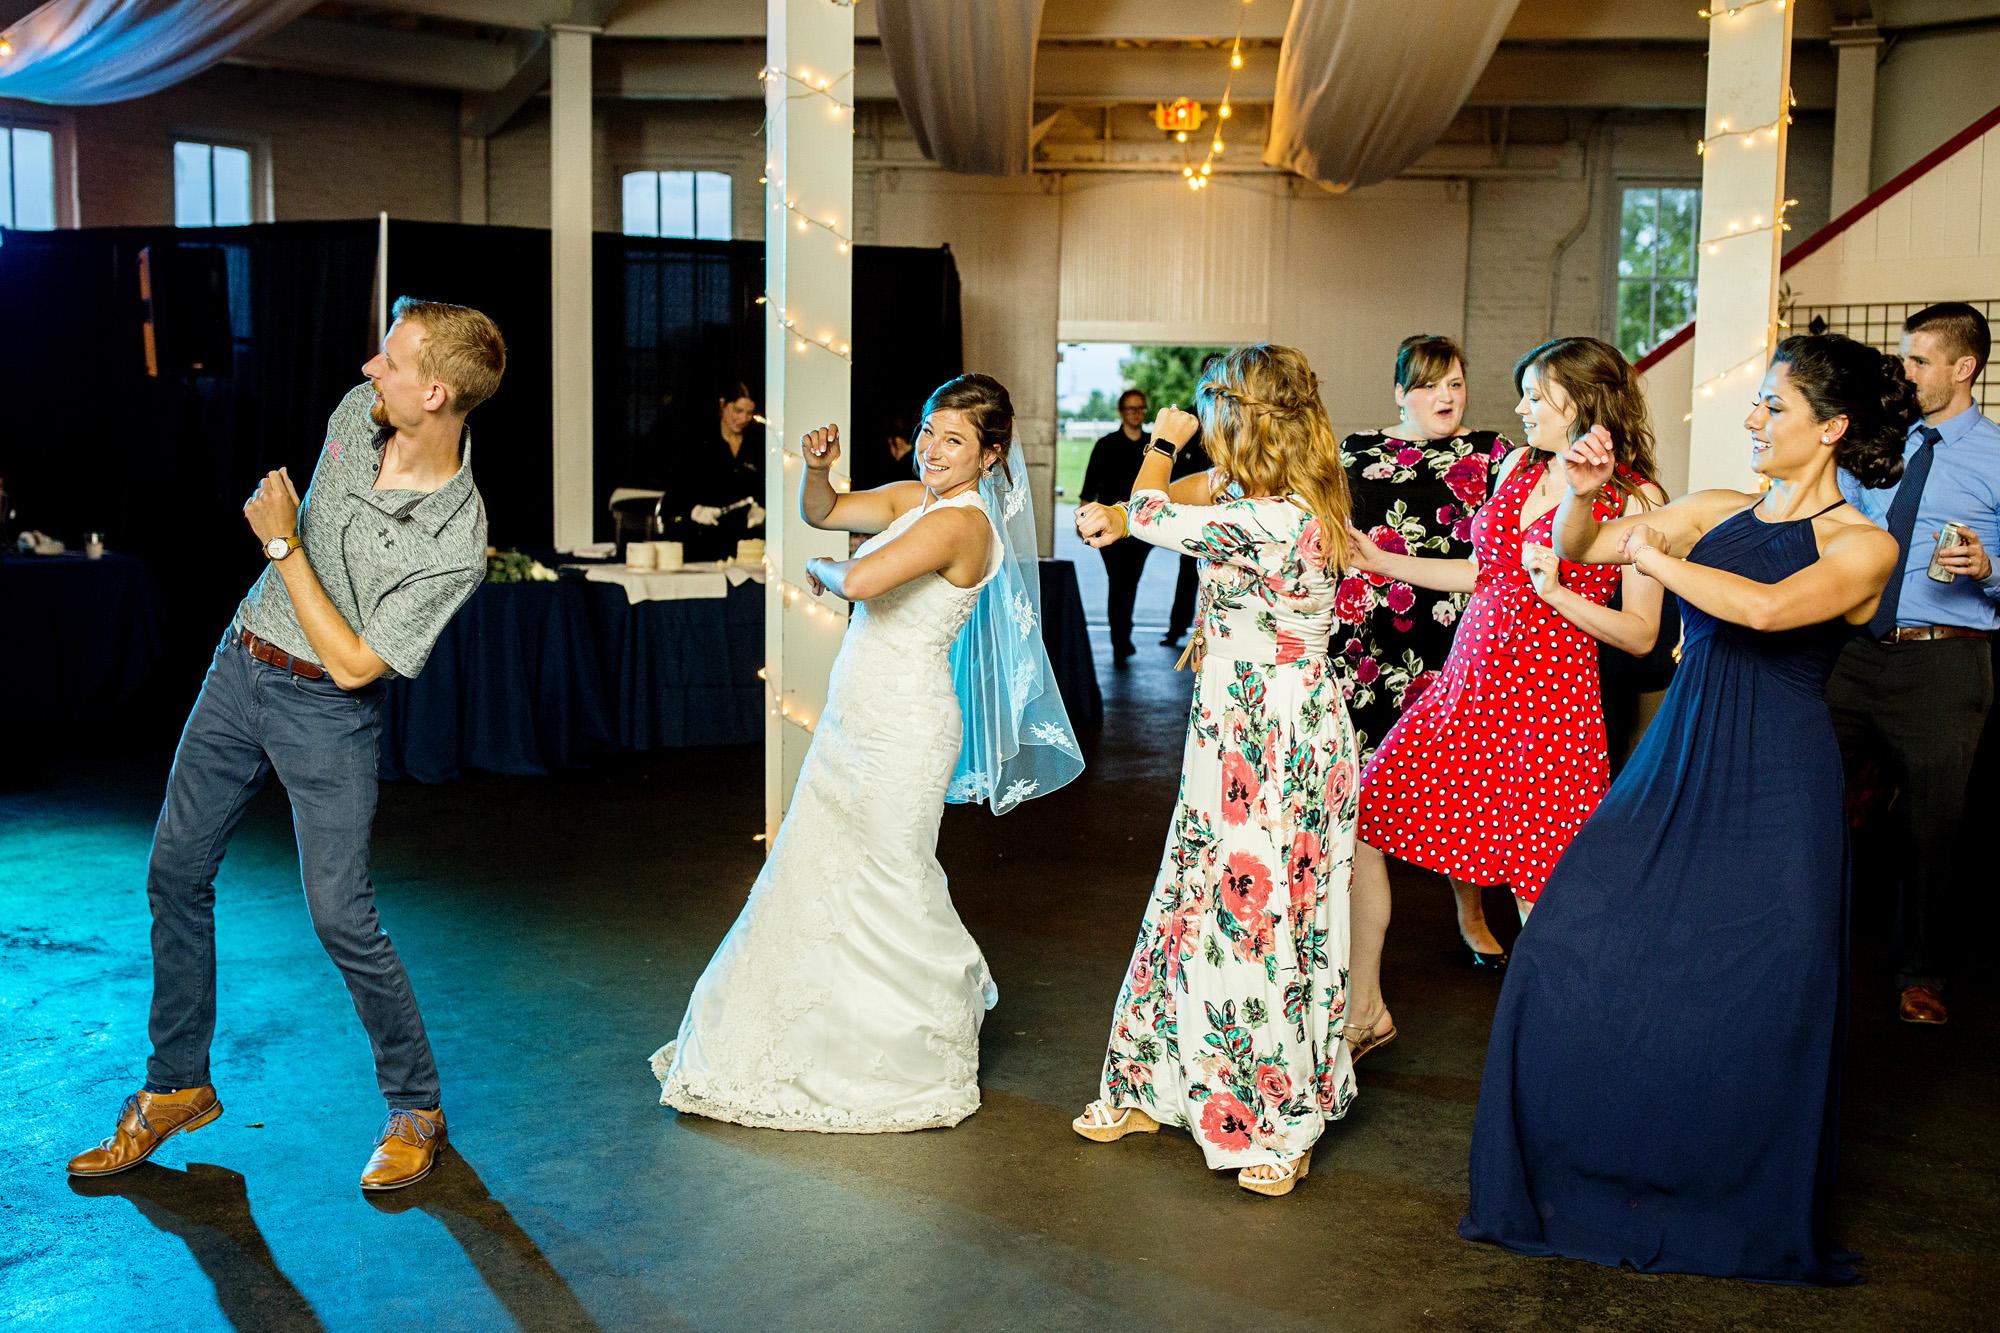 Seriously_Sabrina_Photography_Lexington_Kentucky_Round_Barn_Red_Mile_Stable_of_Memories_Wedding_Hart_118.jpg